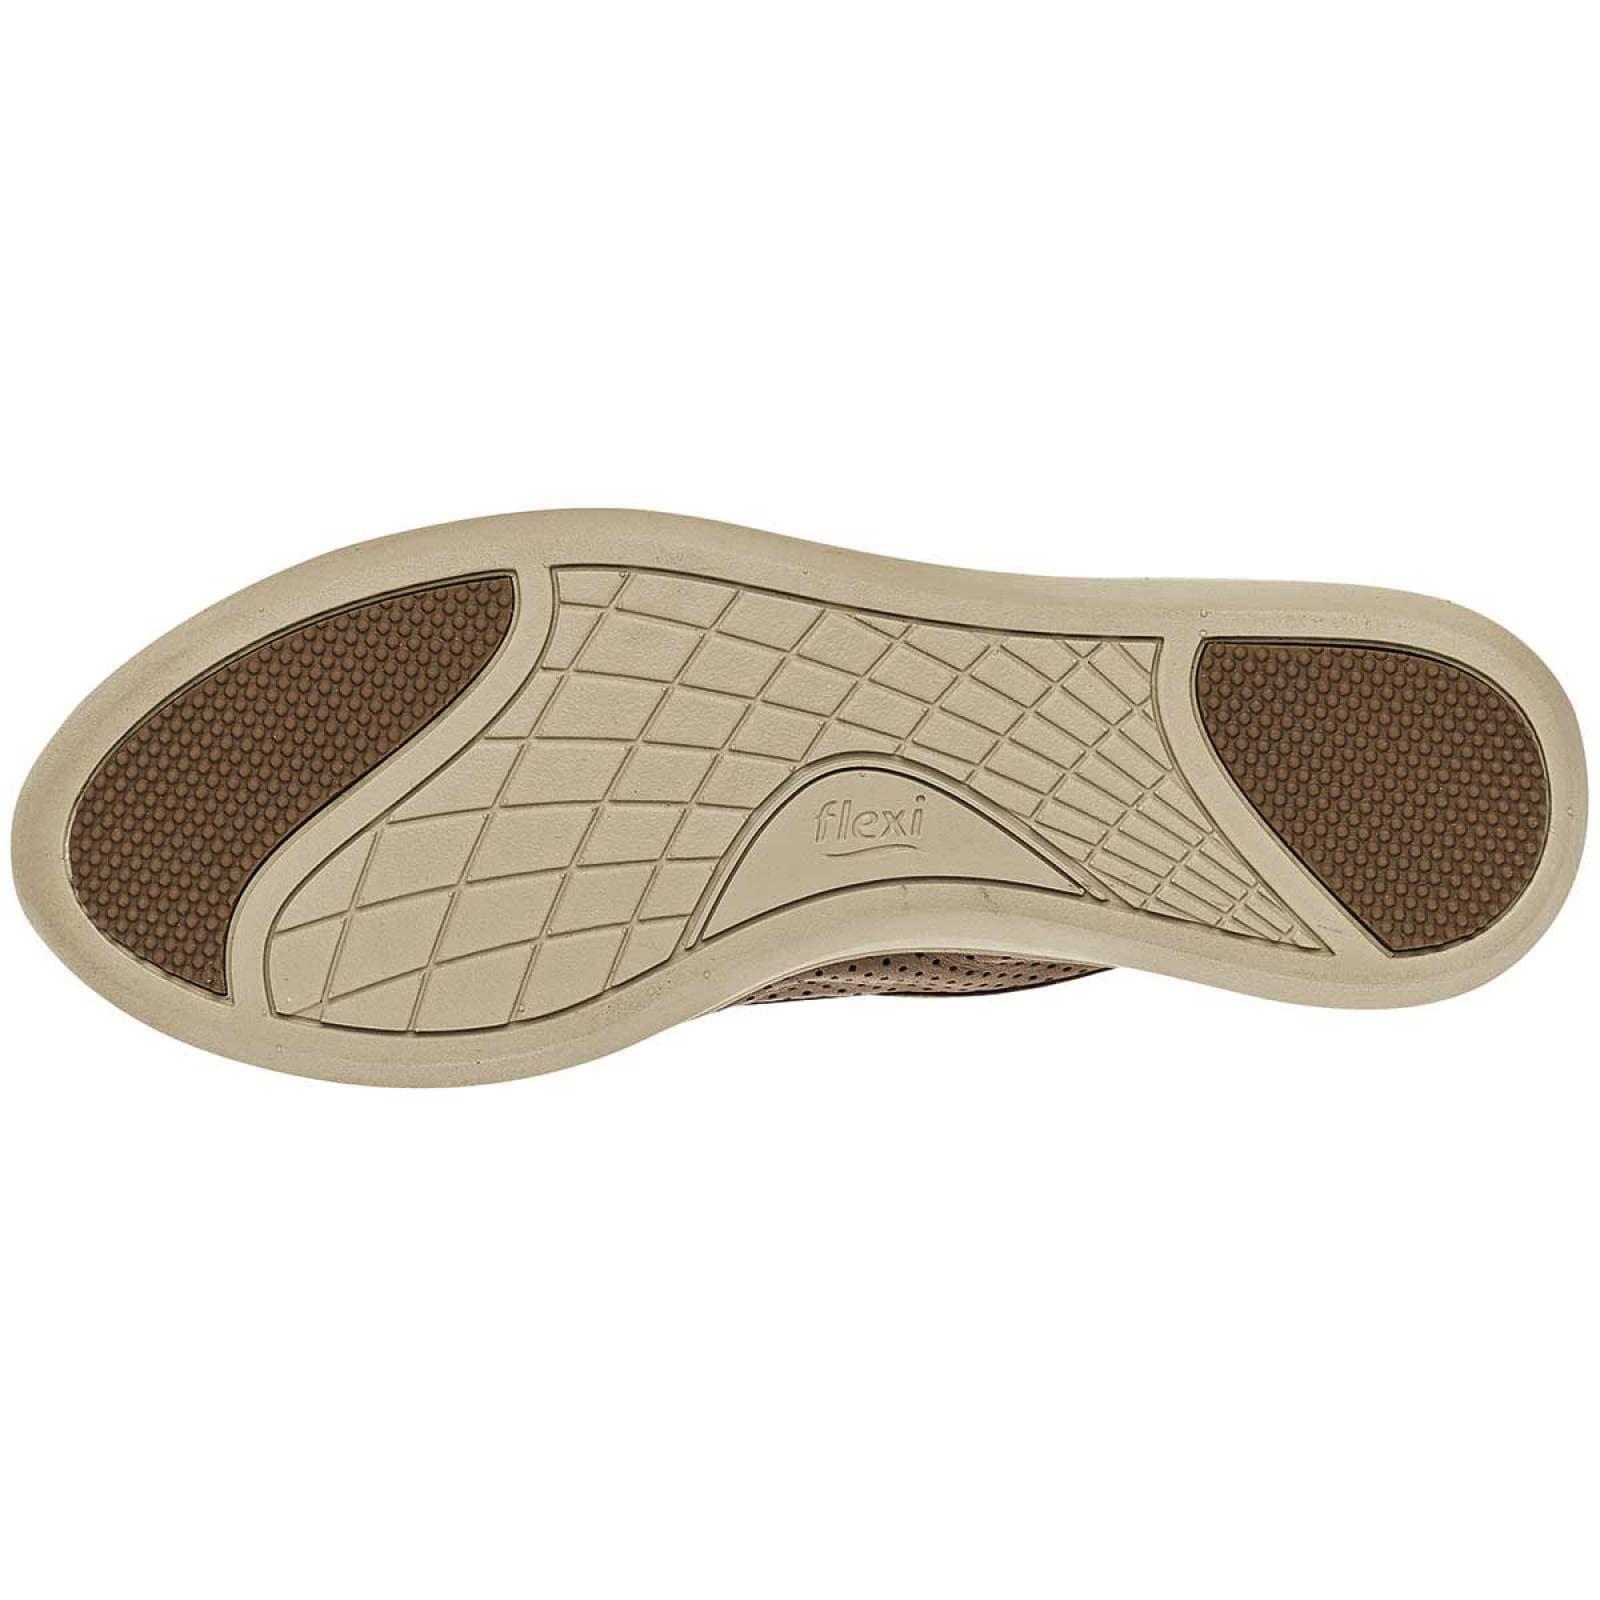 Flexi Zapato Mujer Camel